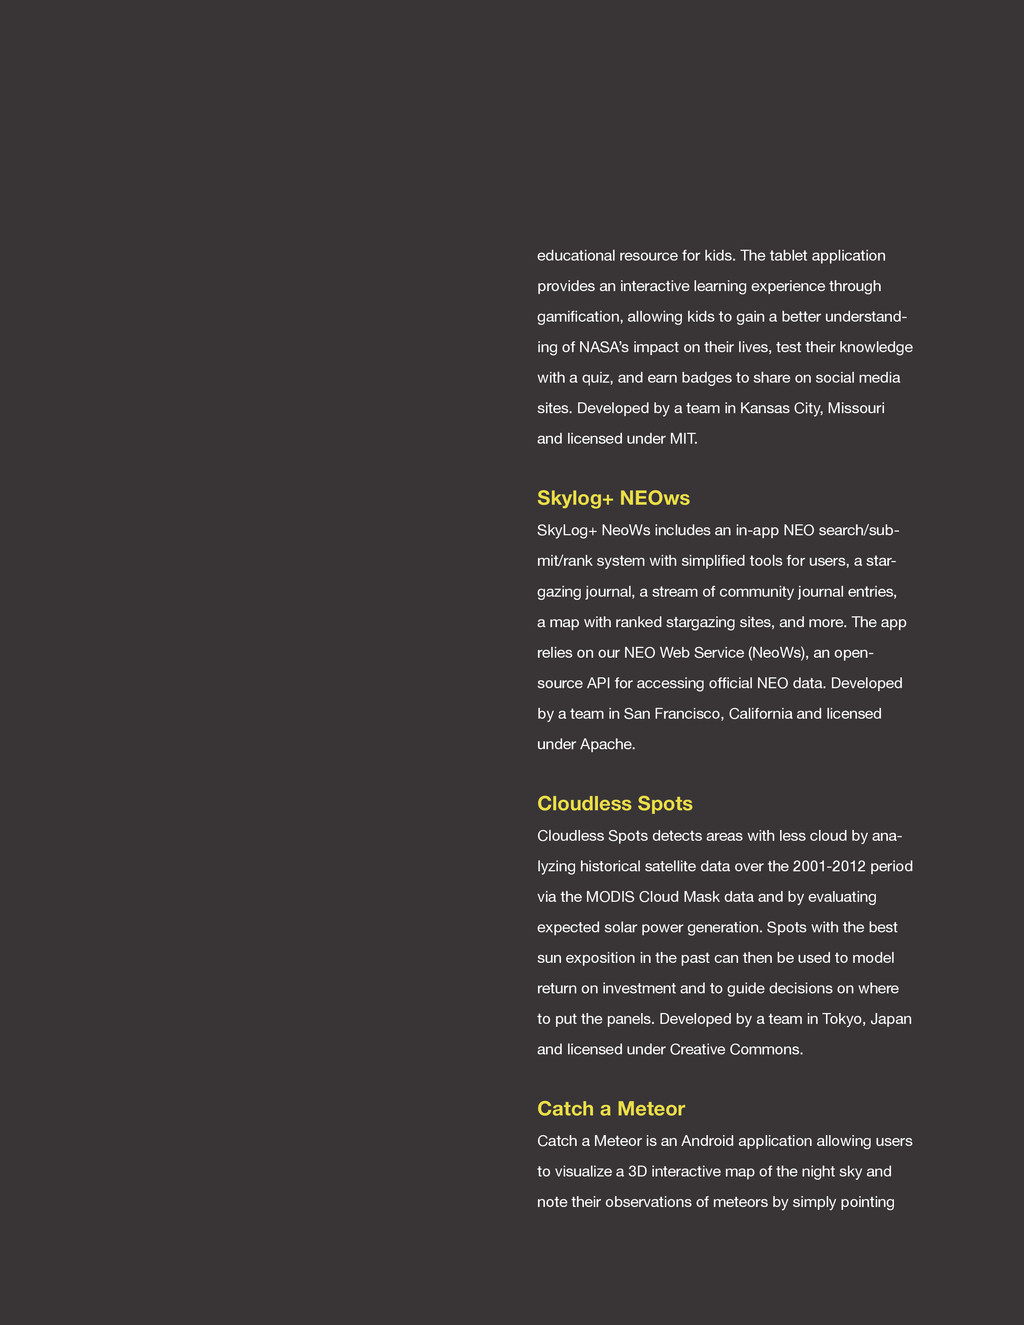 spaceappschallenge.org educational resource for...